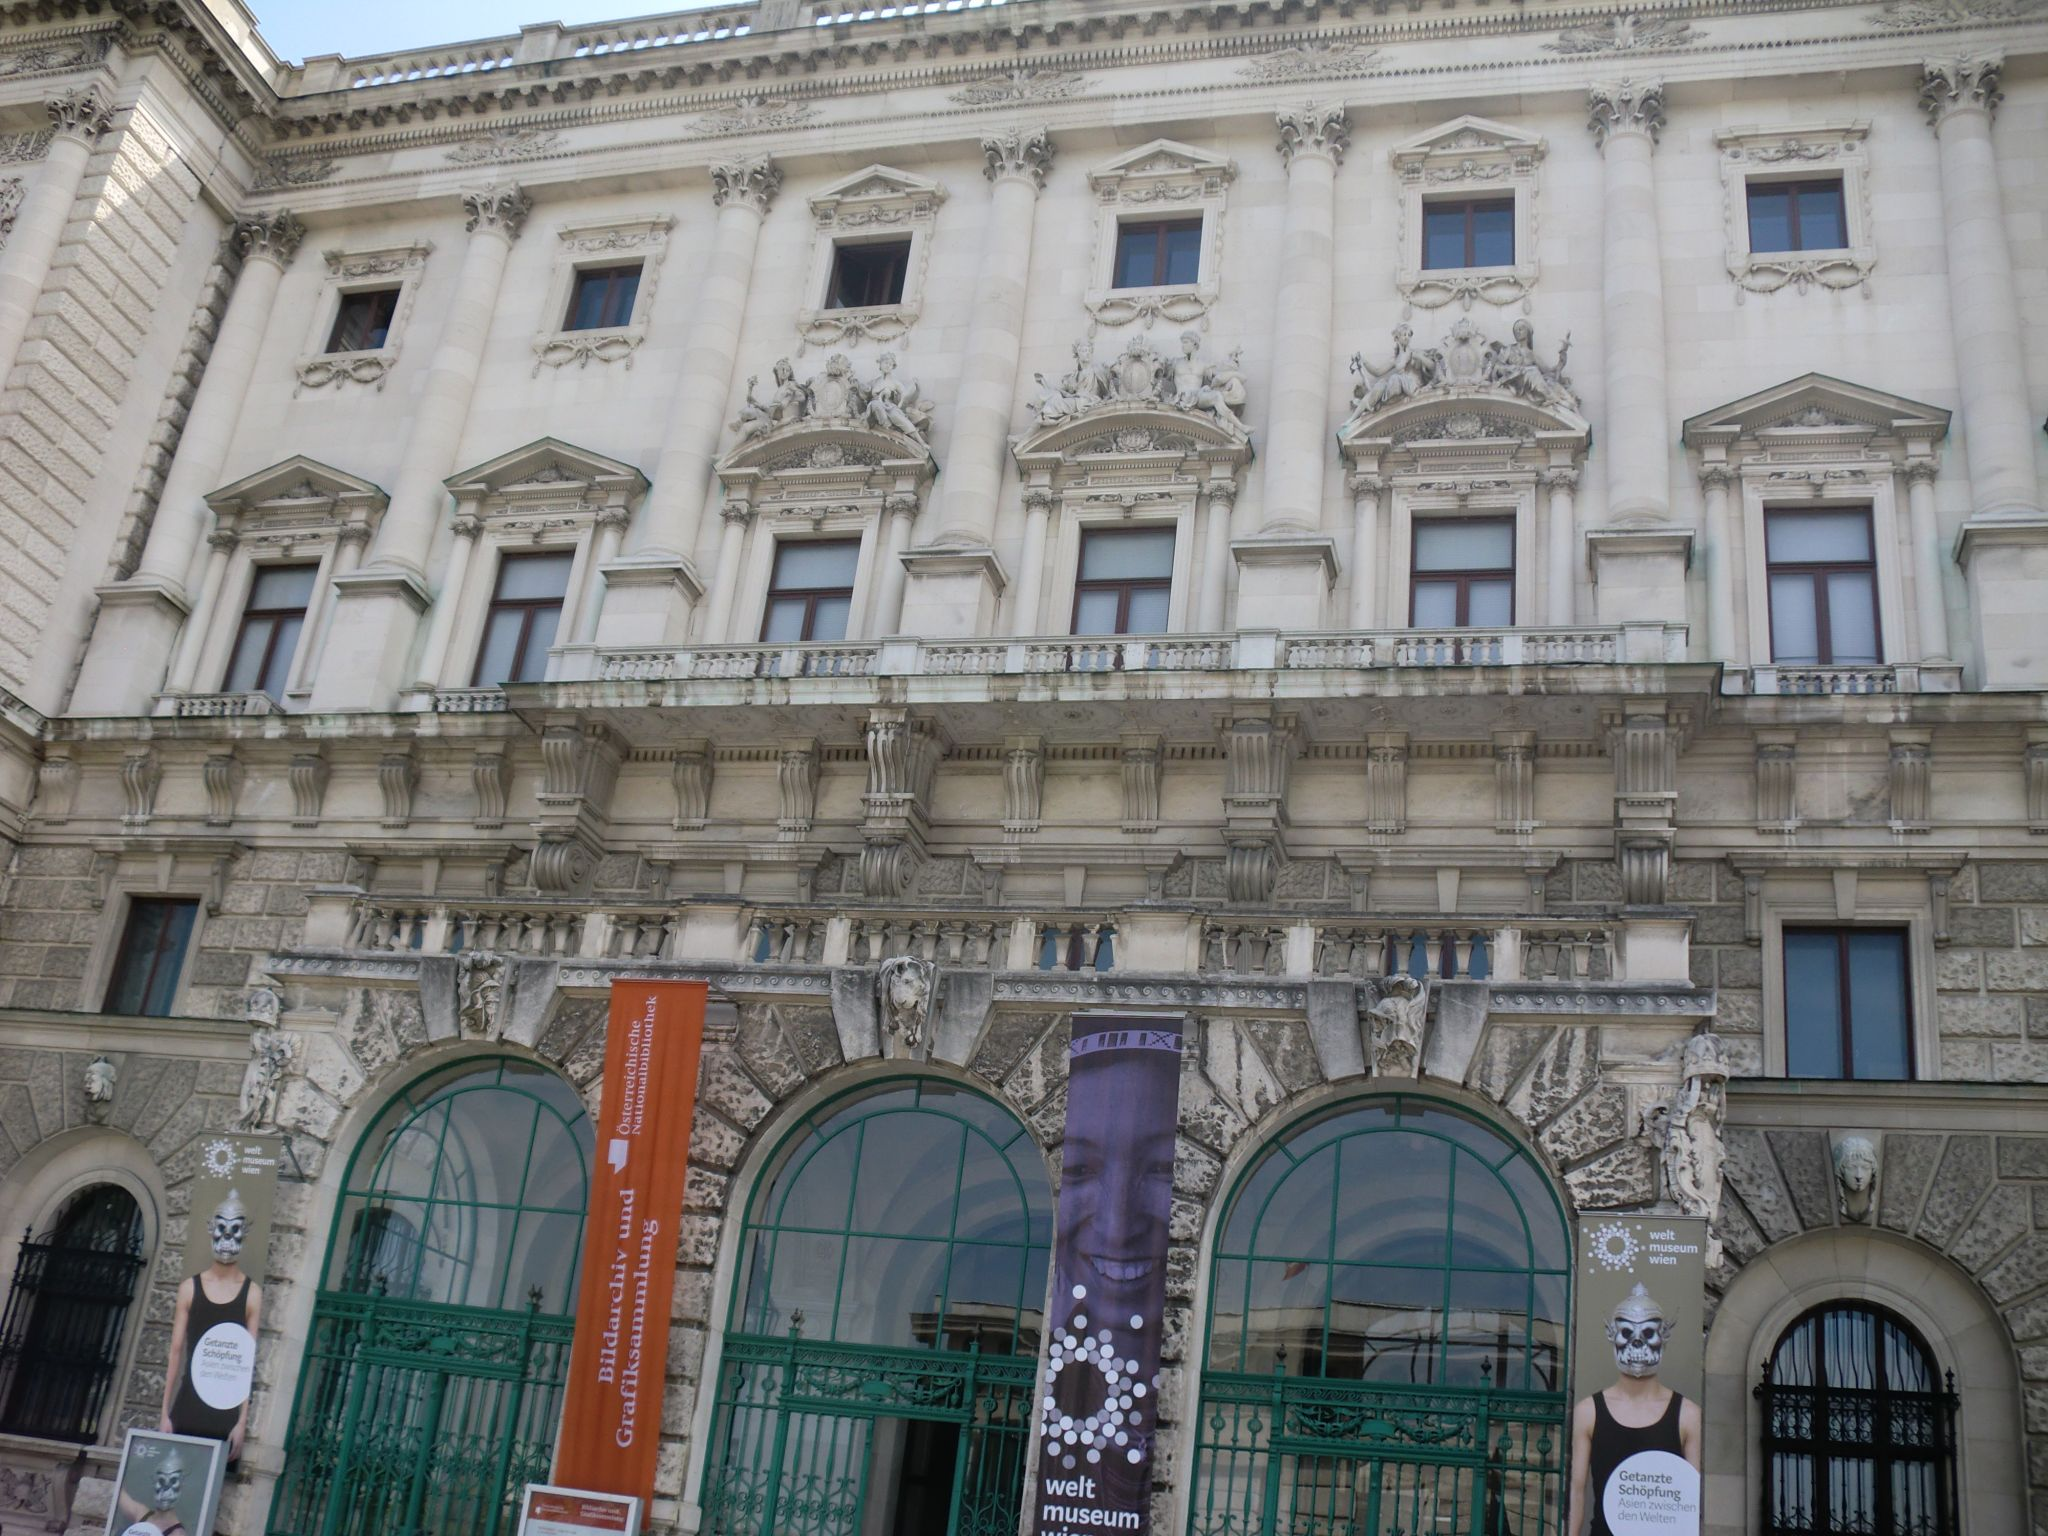 Vienna Hofburg 15 1440x1080 - Vienna: elegant beauty